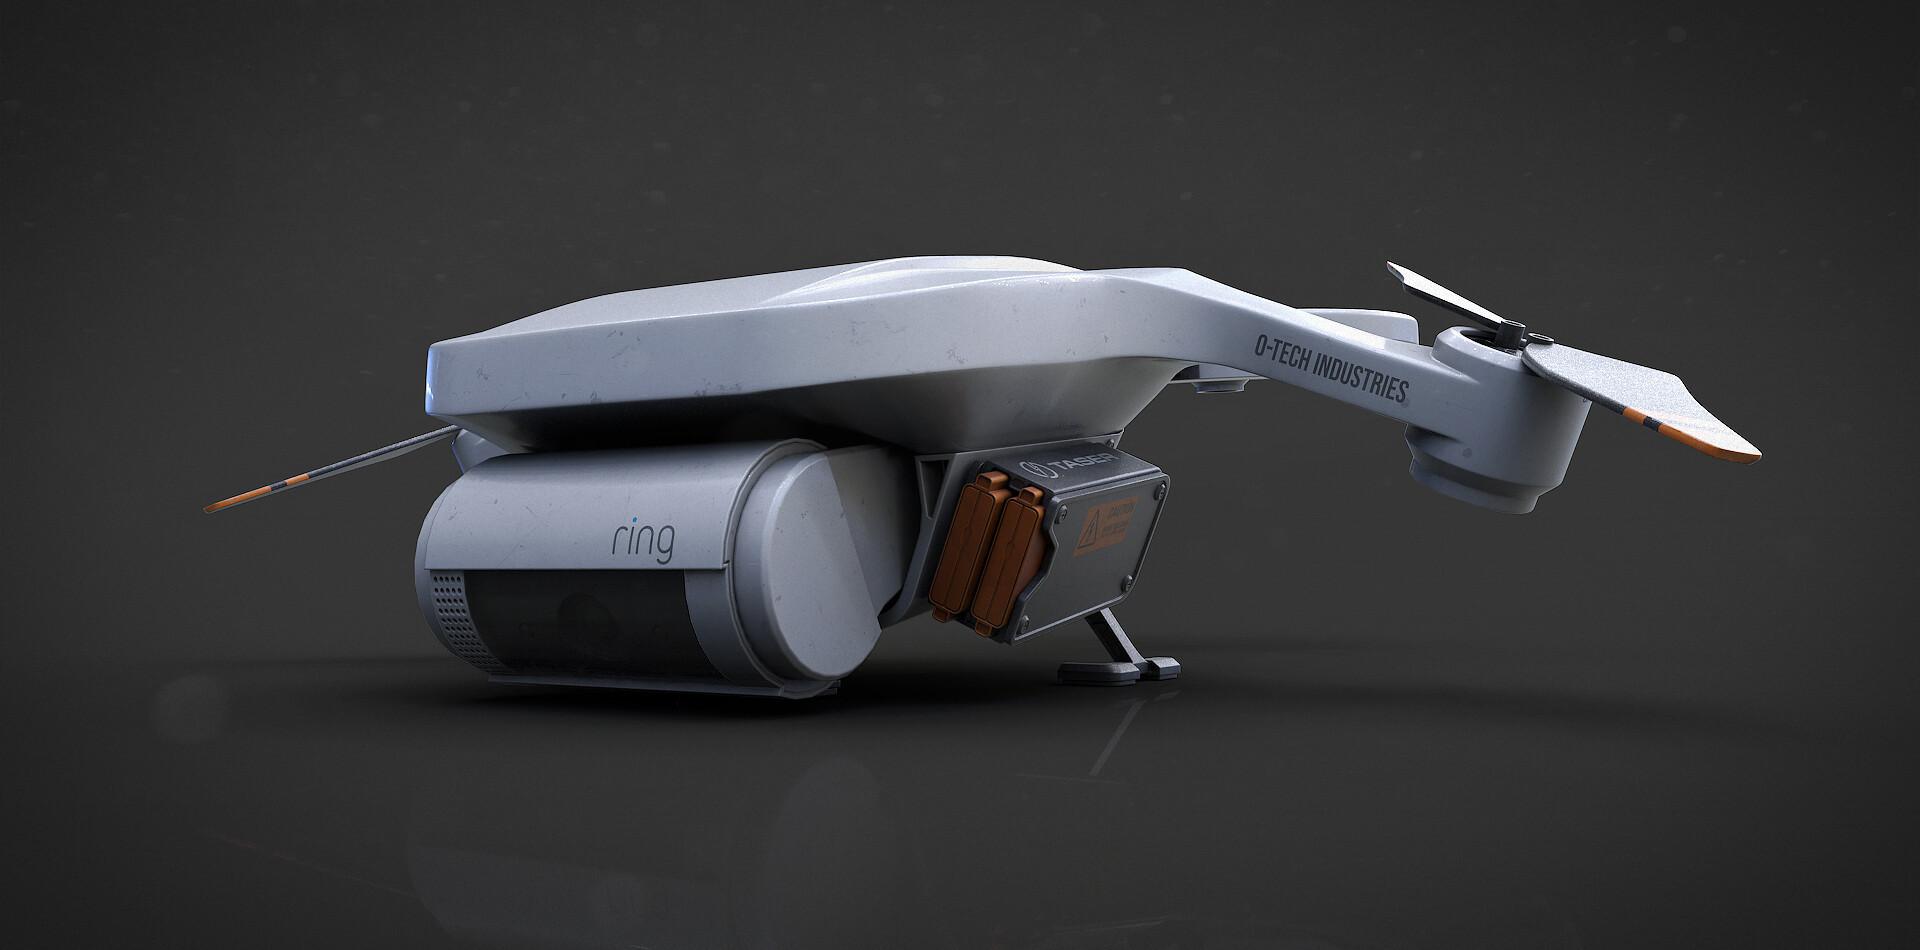 Mathew o drone 3